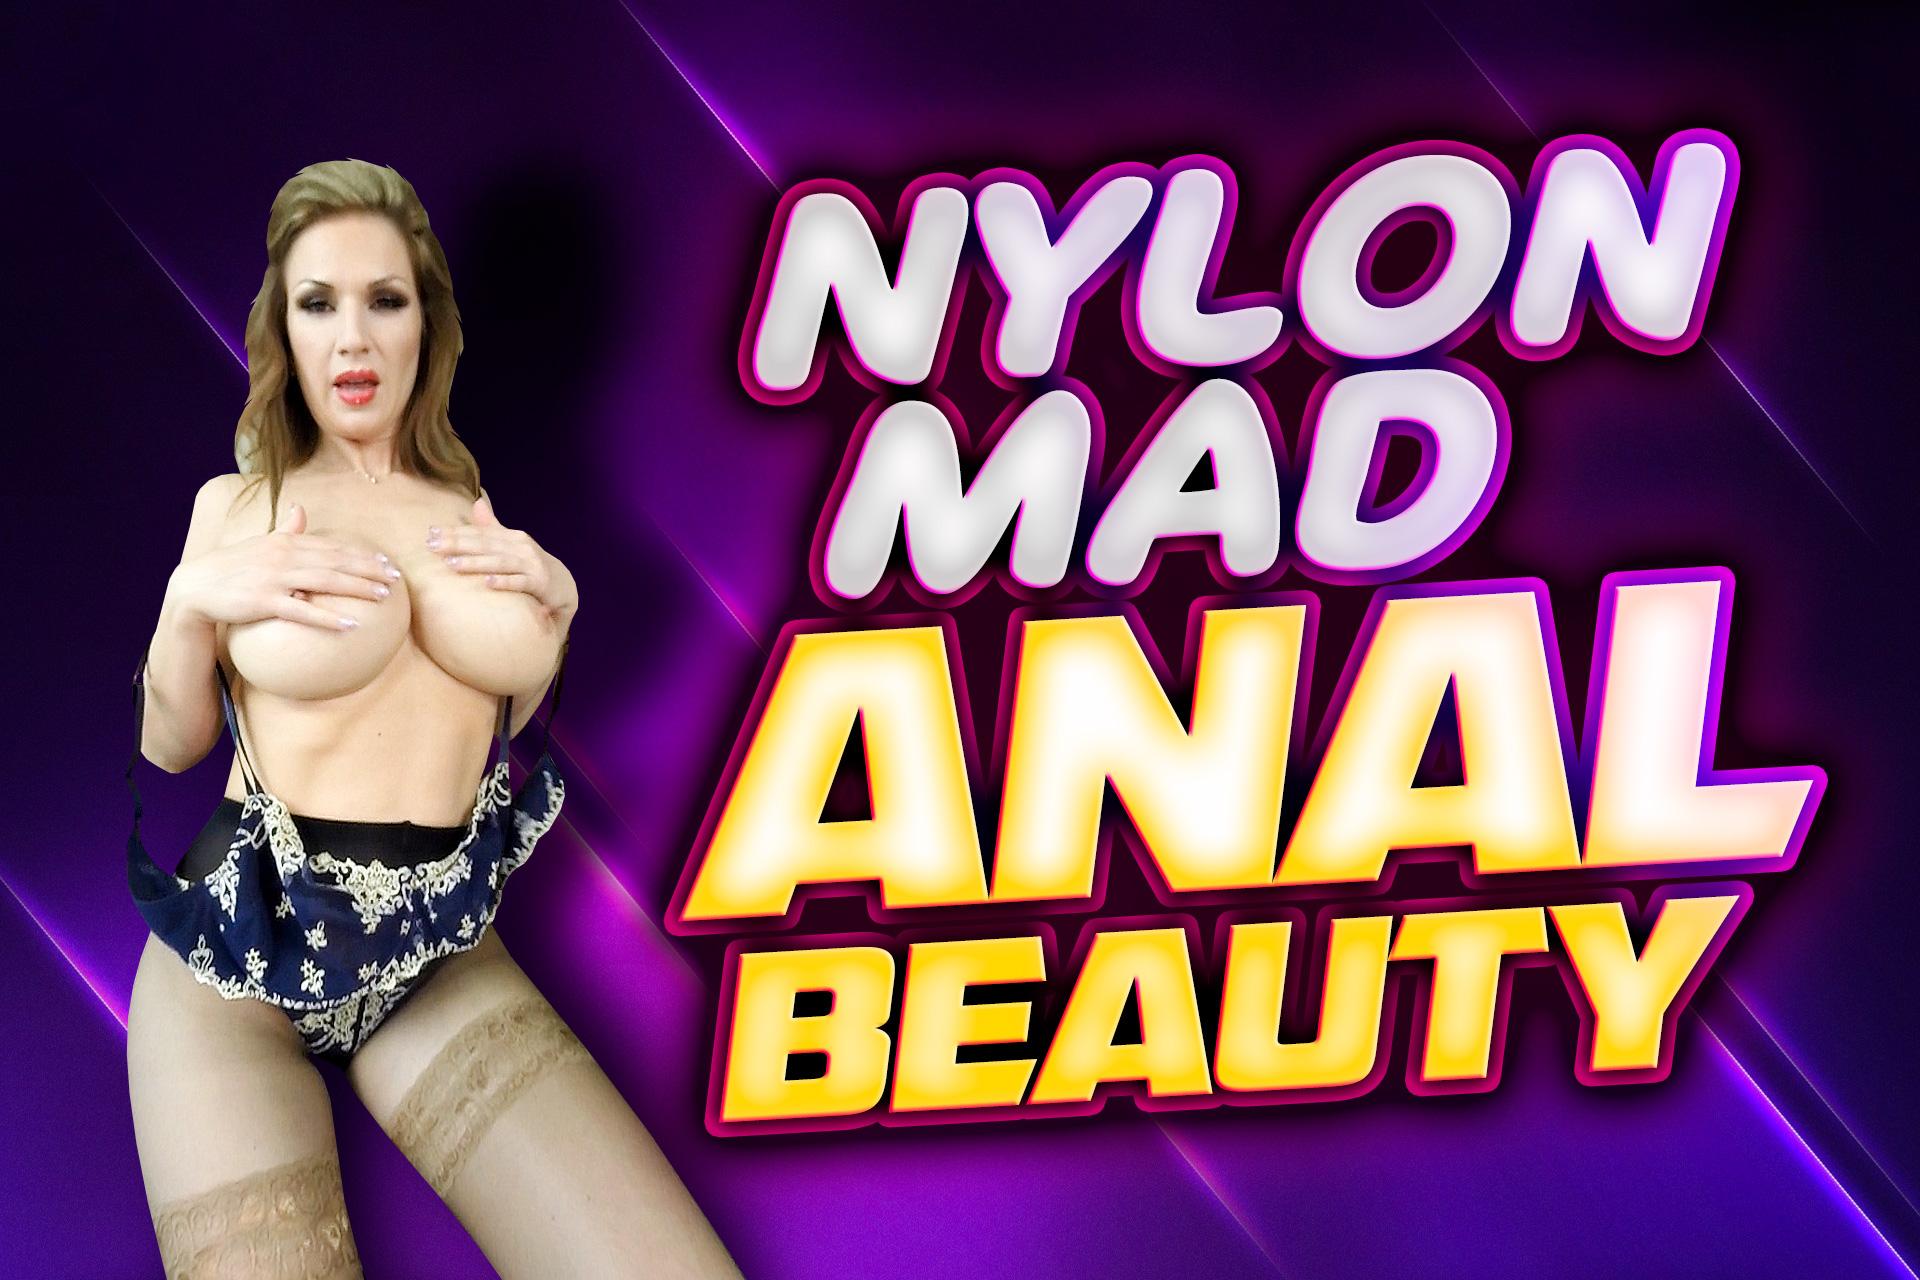 Nylon Mad Anal Beauty Milf Carol Gold